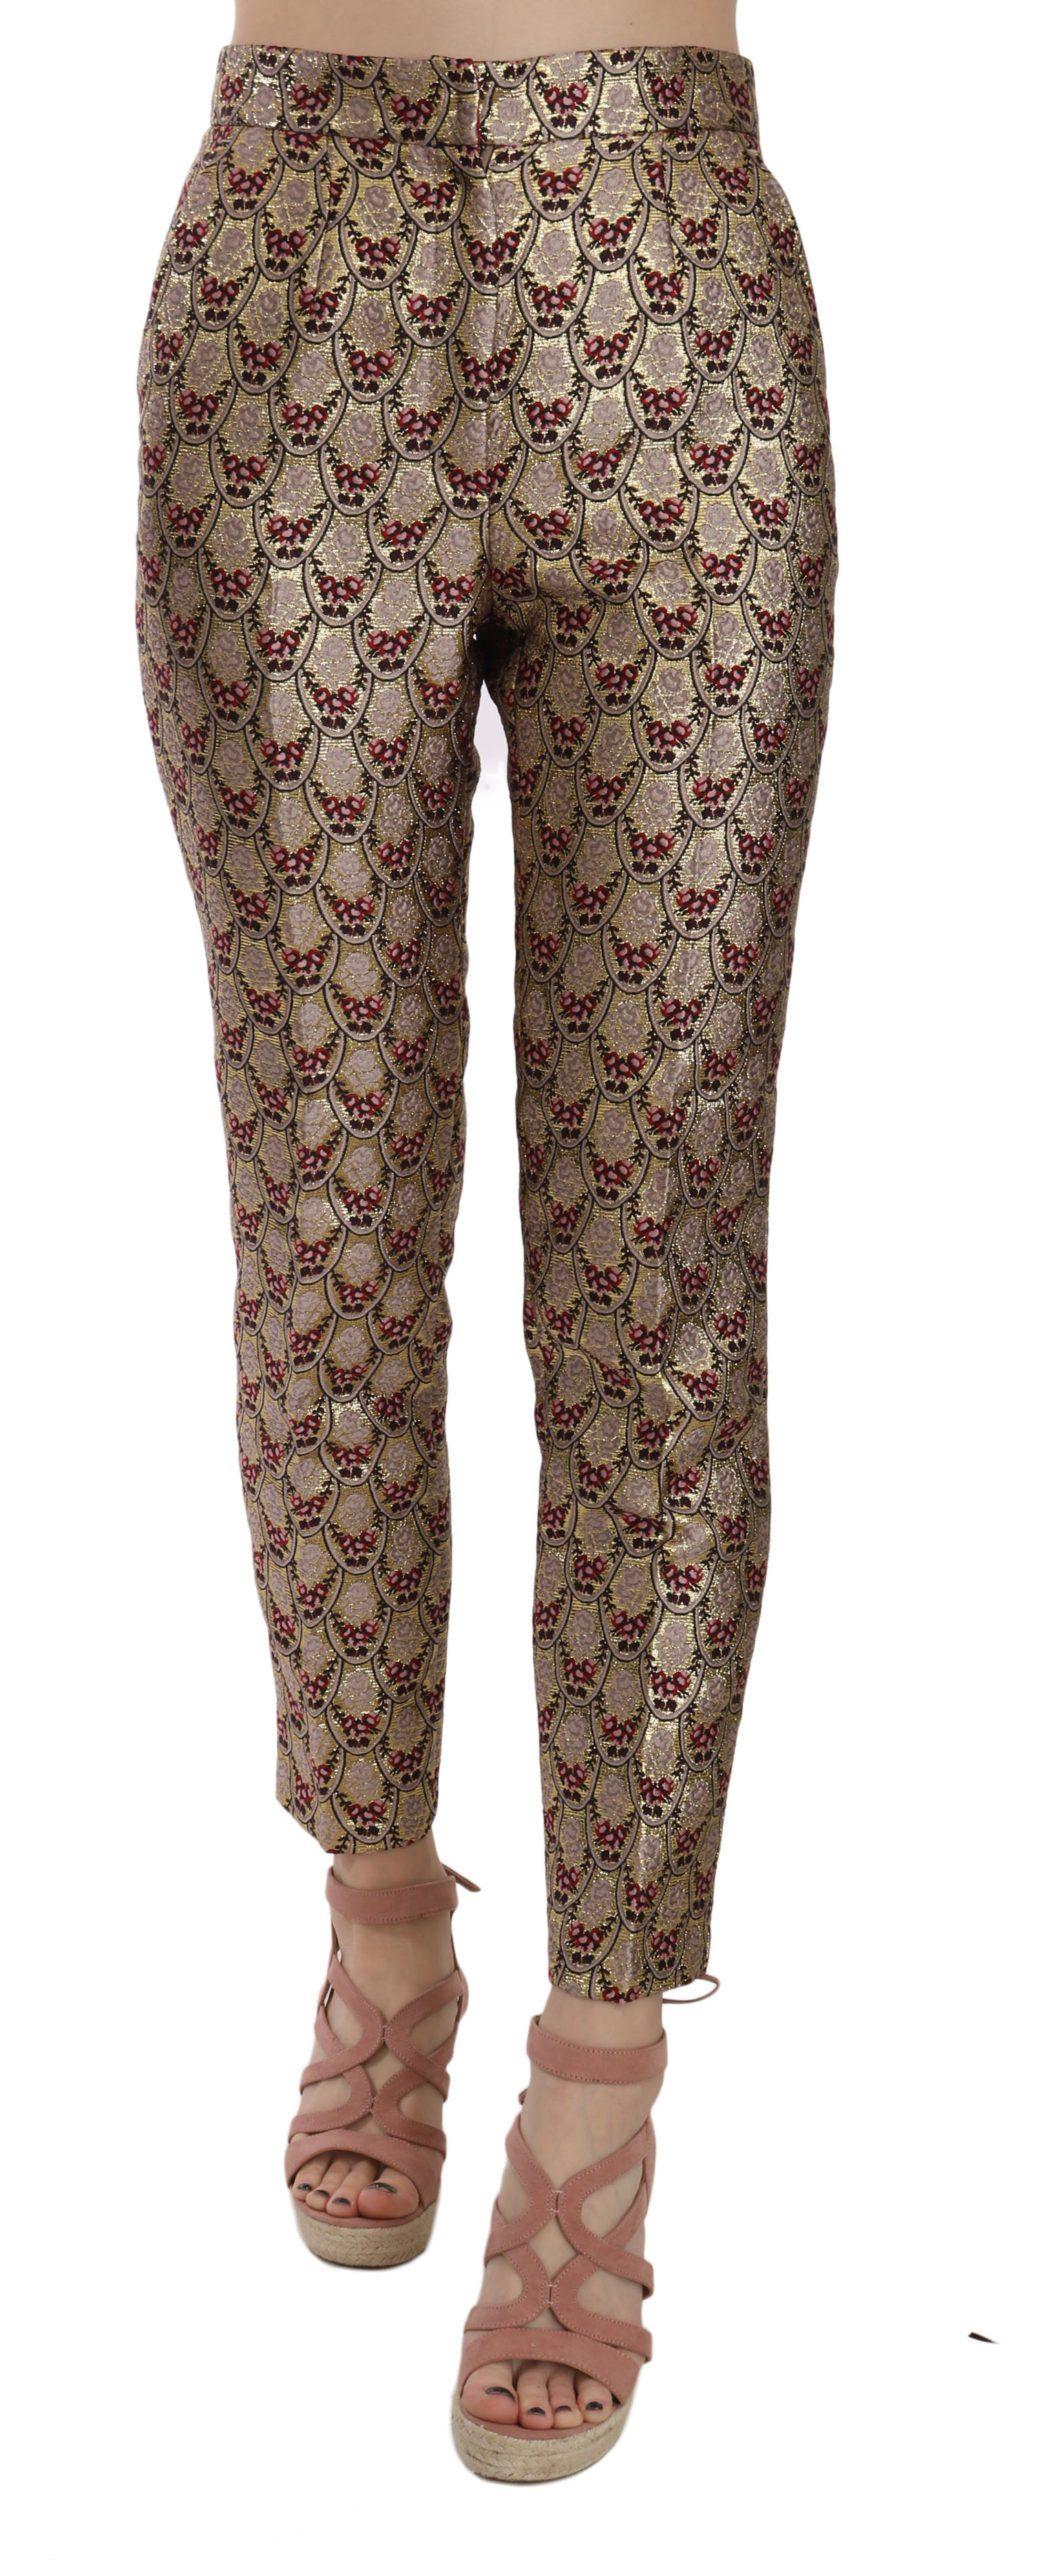 Dolce & Gabbana Women's Jacquard Metallic Tapered Trouser Gold PAN70031 - IT38 XS